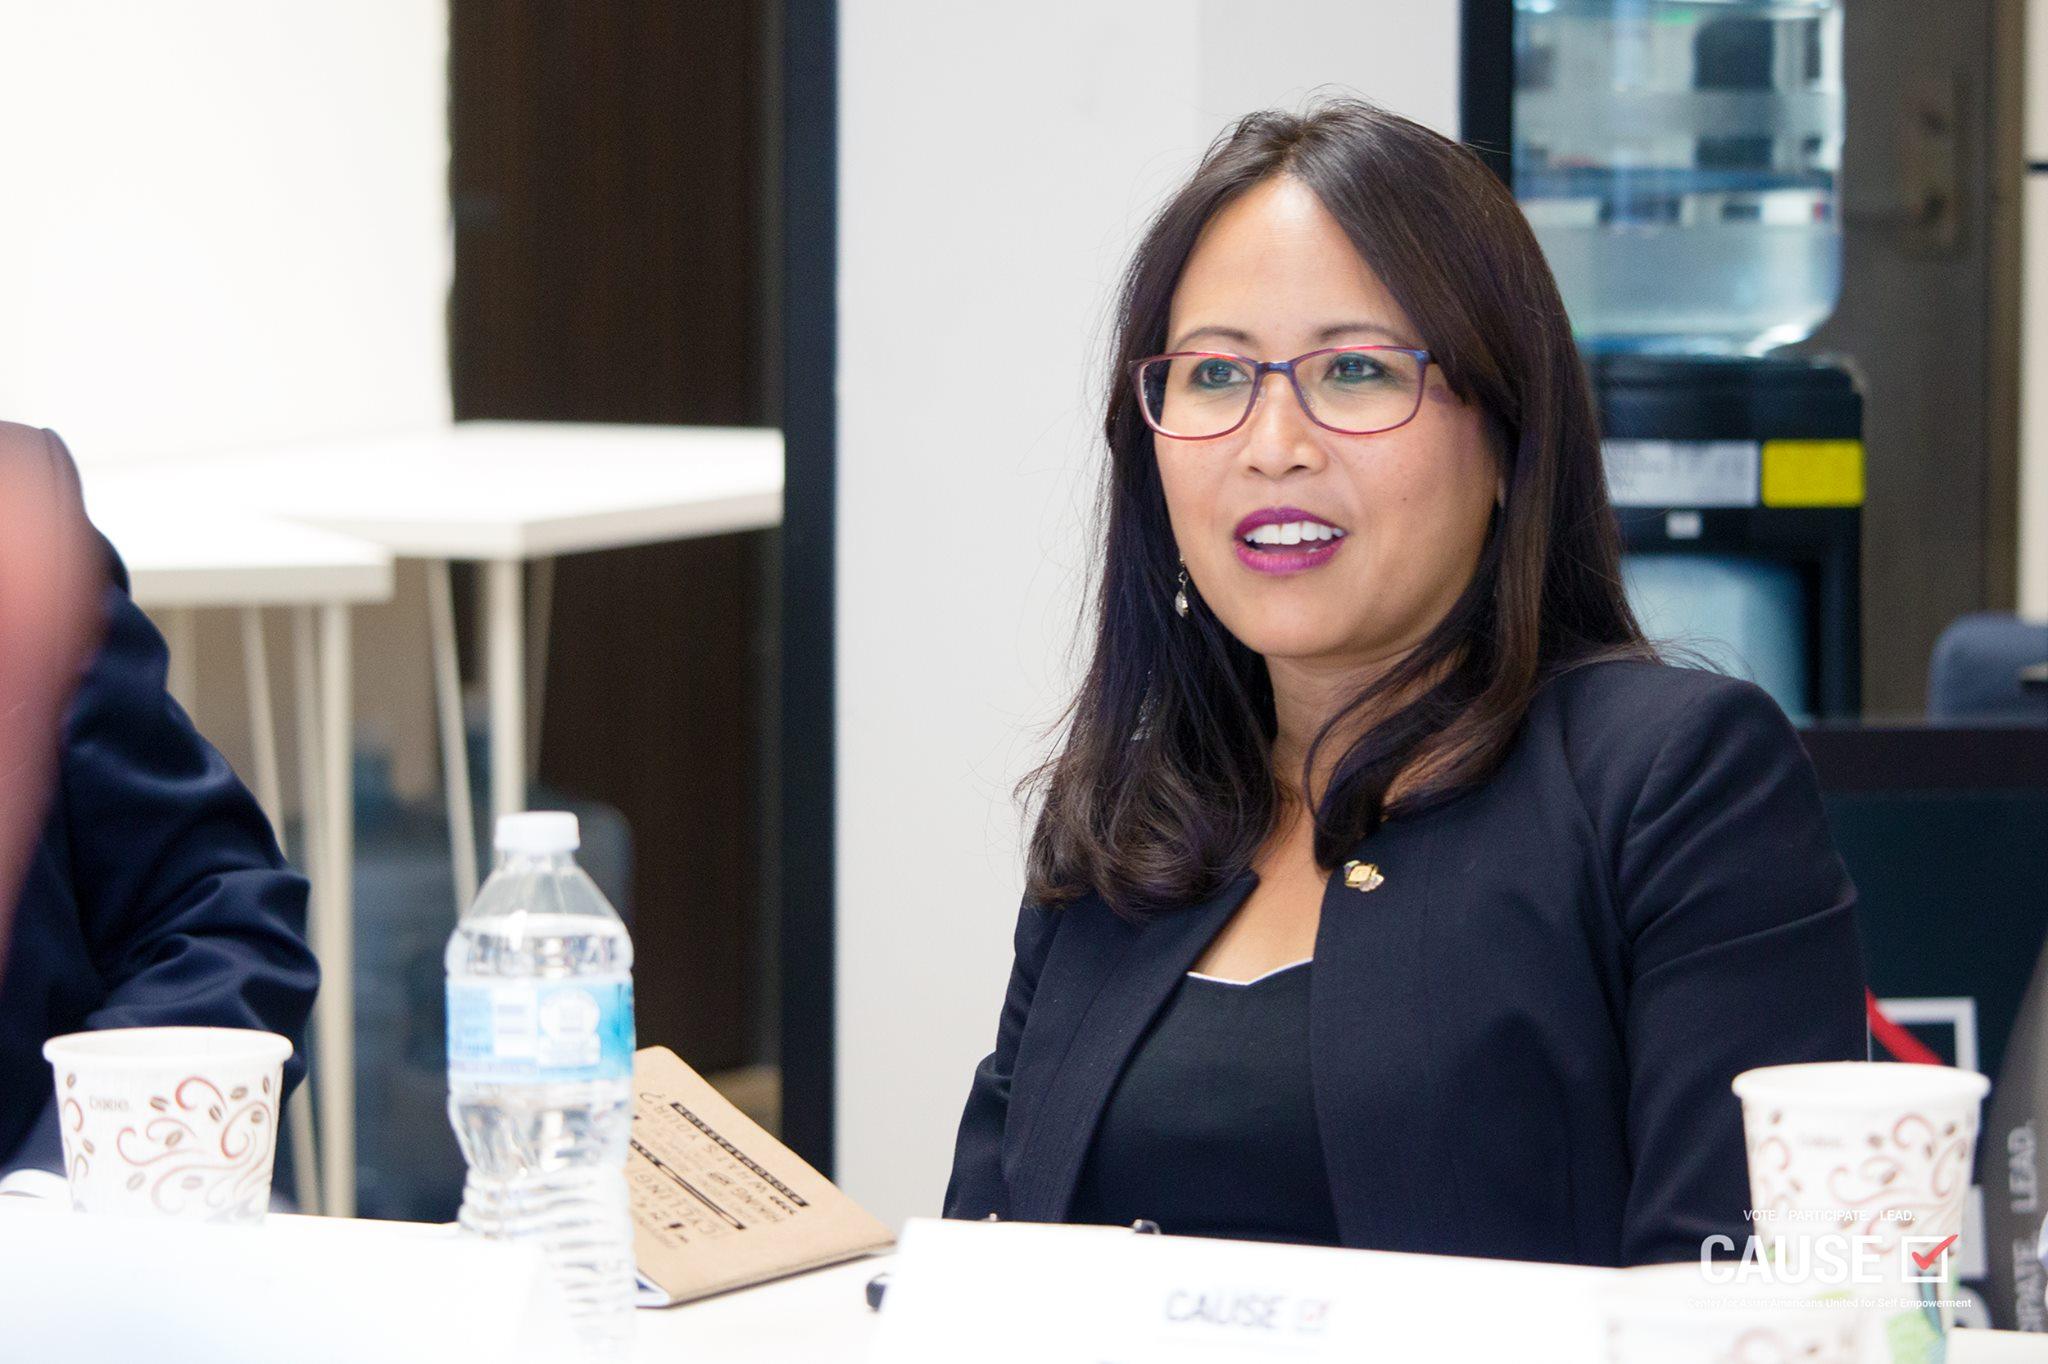 Councilwoman Rachelle Arizmendi